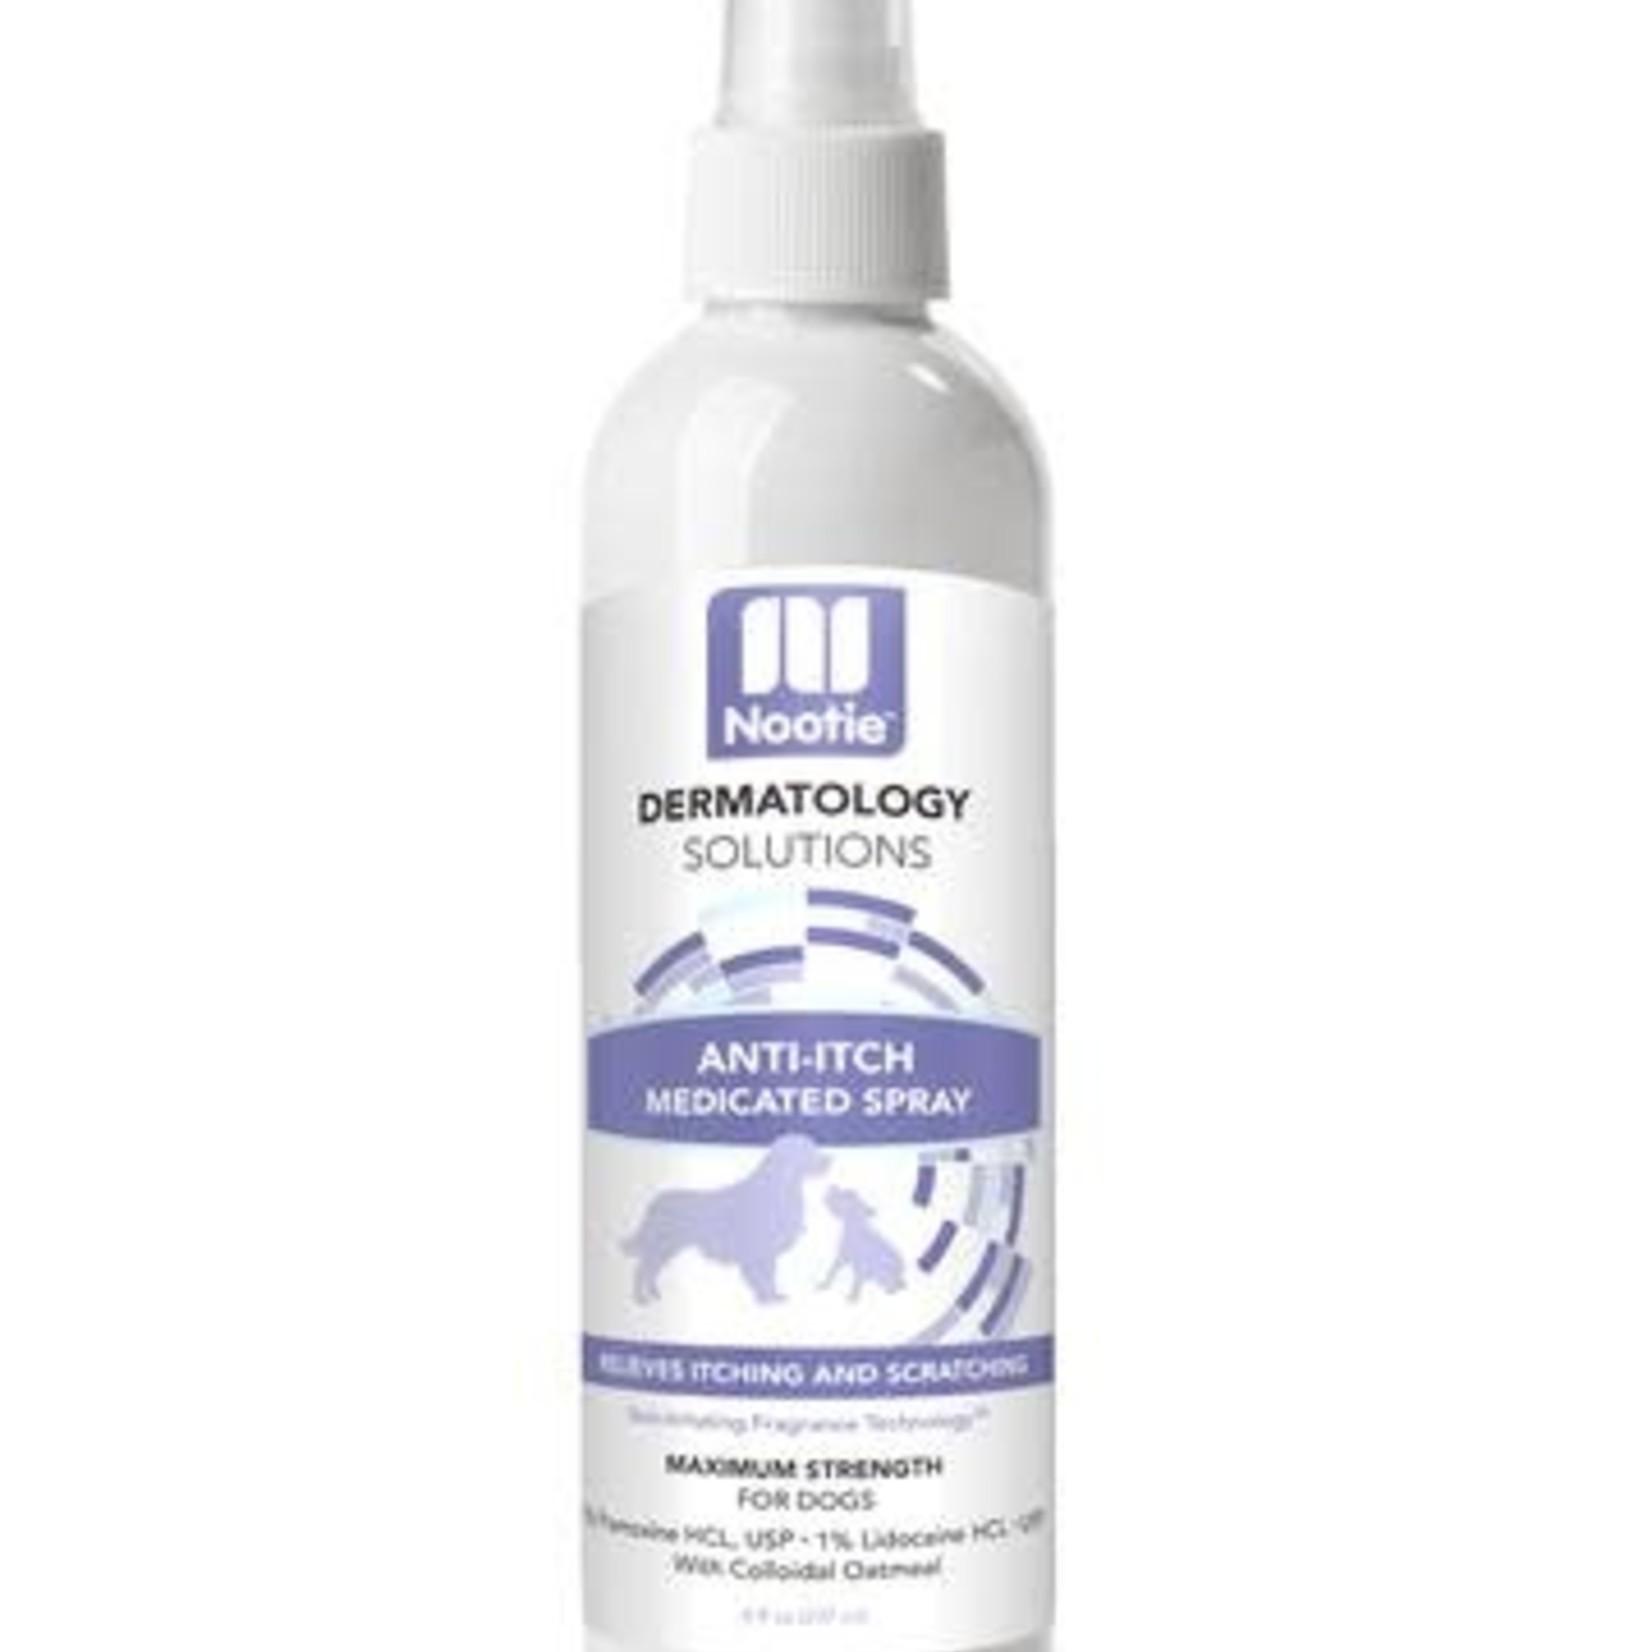 Nootie Anti-Itch Medicated Spray 8 OZ